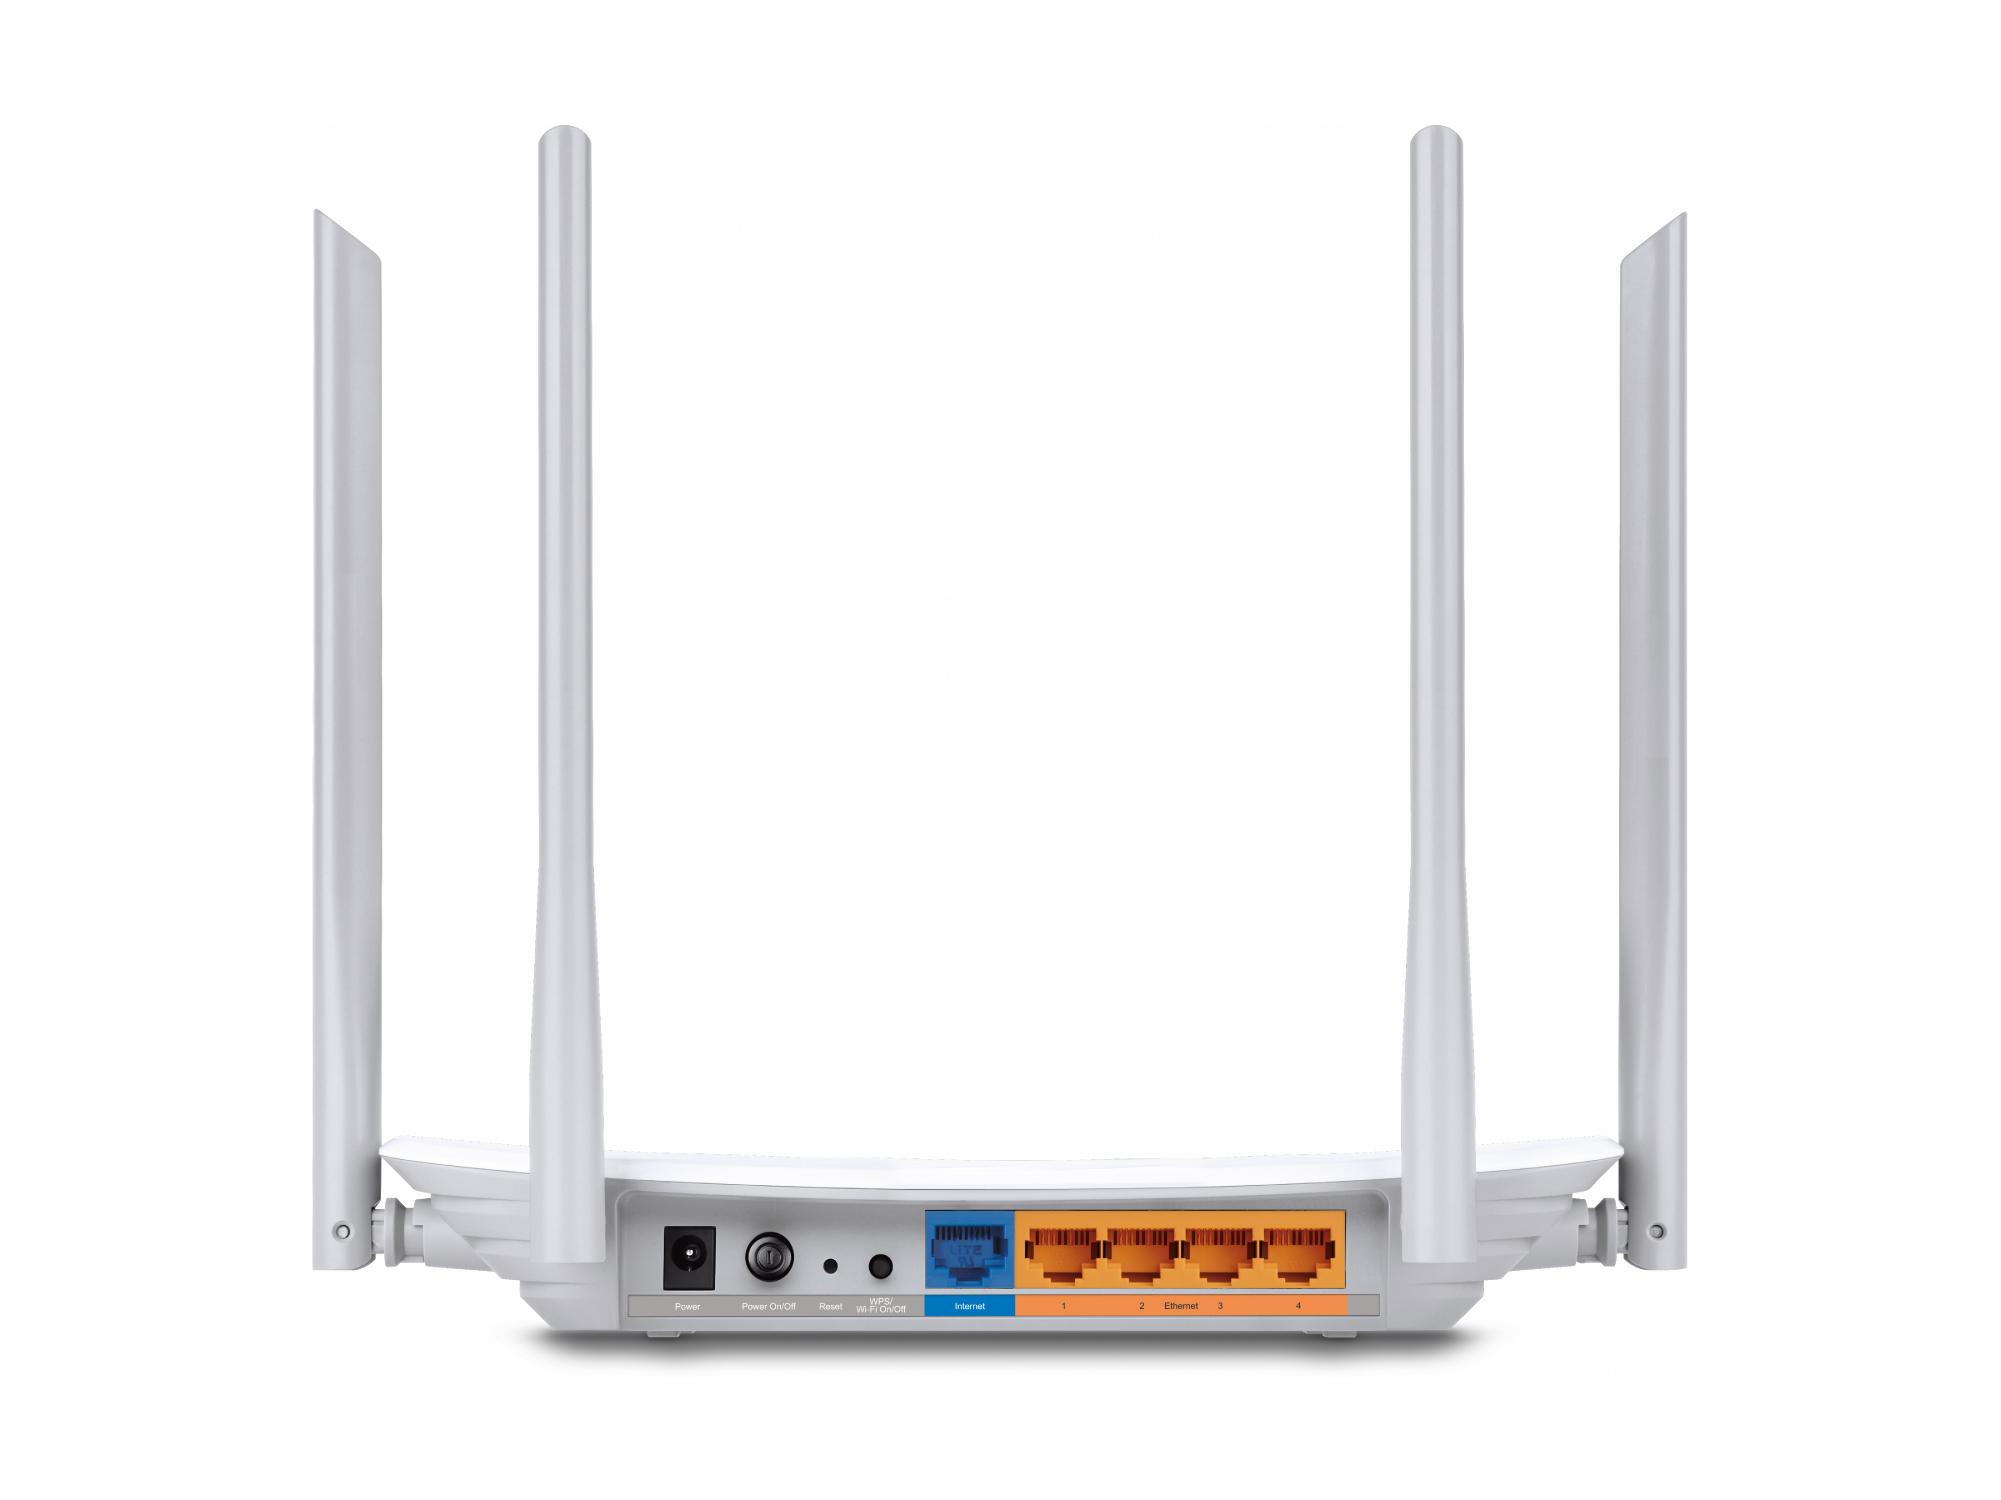 Router Wi-Fi AC1200 con 4 porte LAN Archer C50